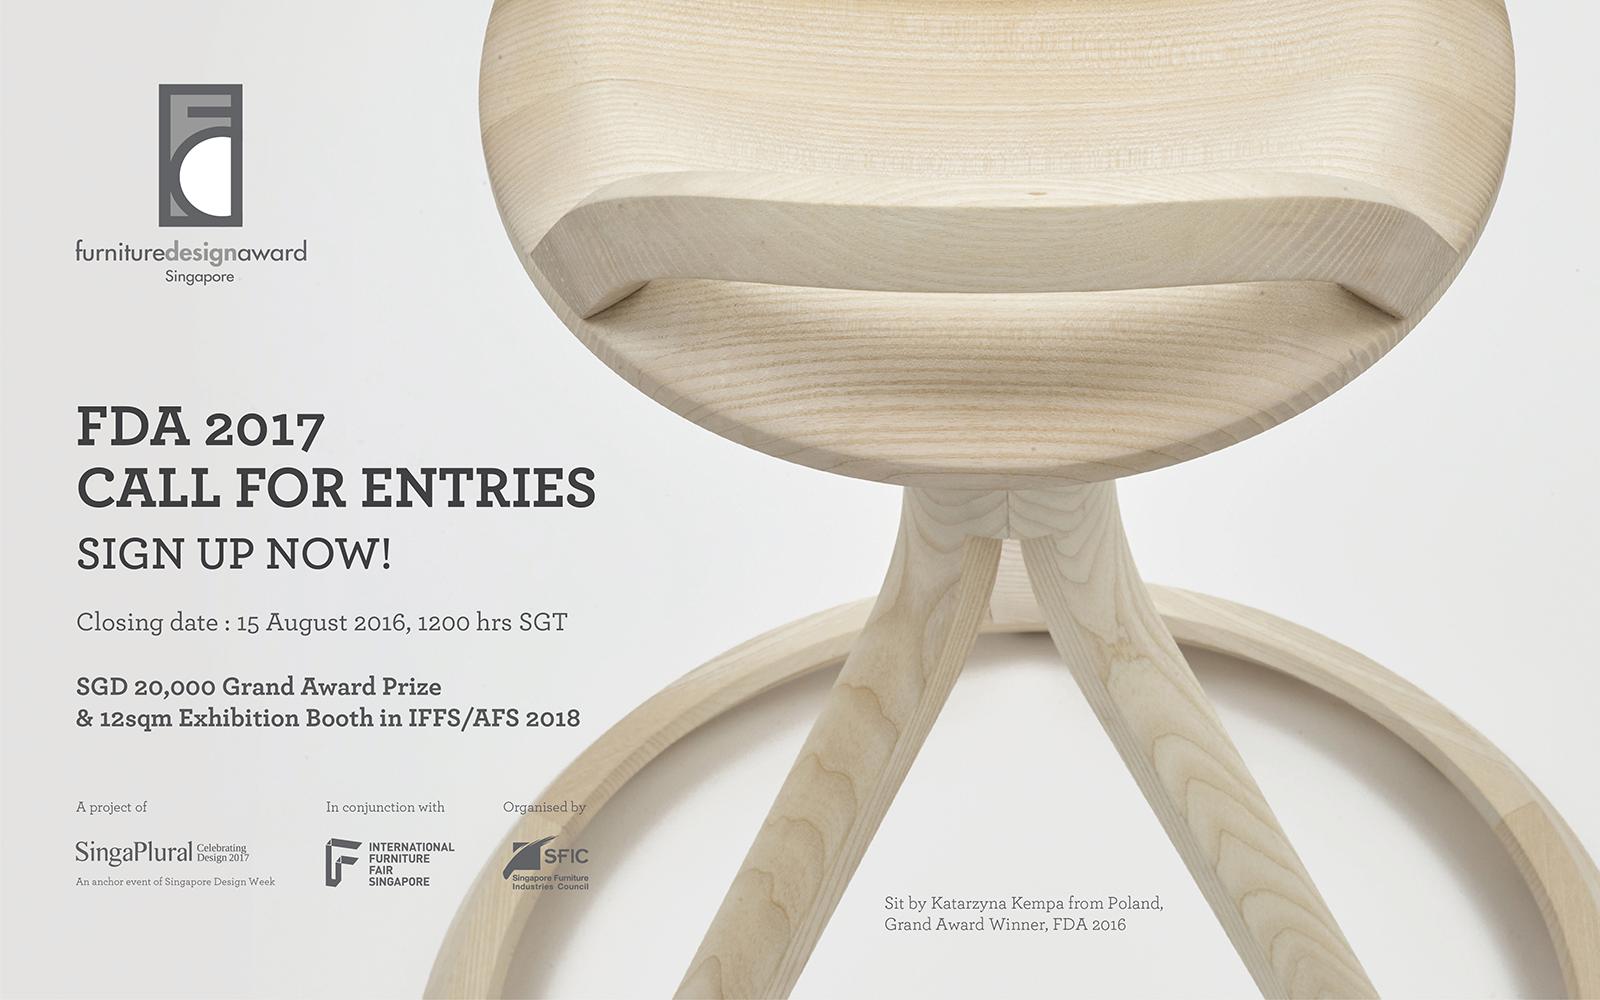 Furniture design award 2017 artconnect for Chair design awards